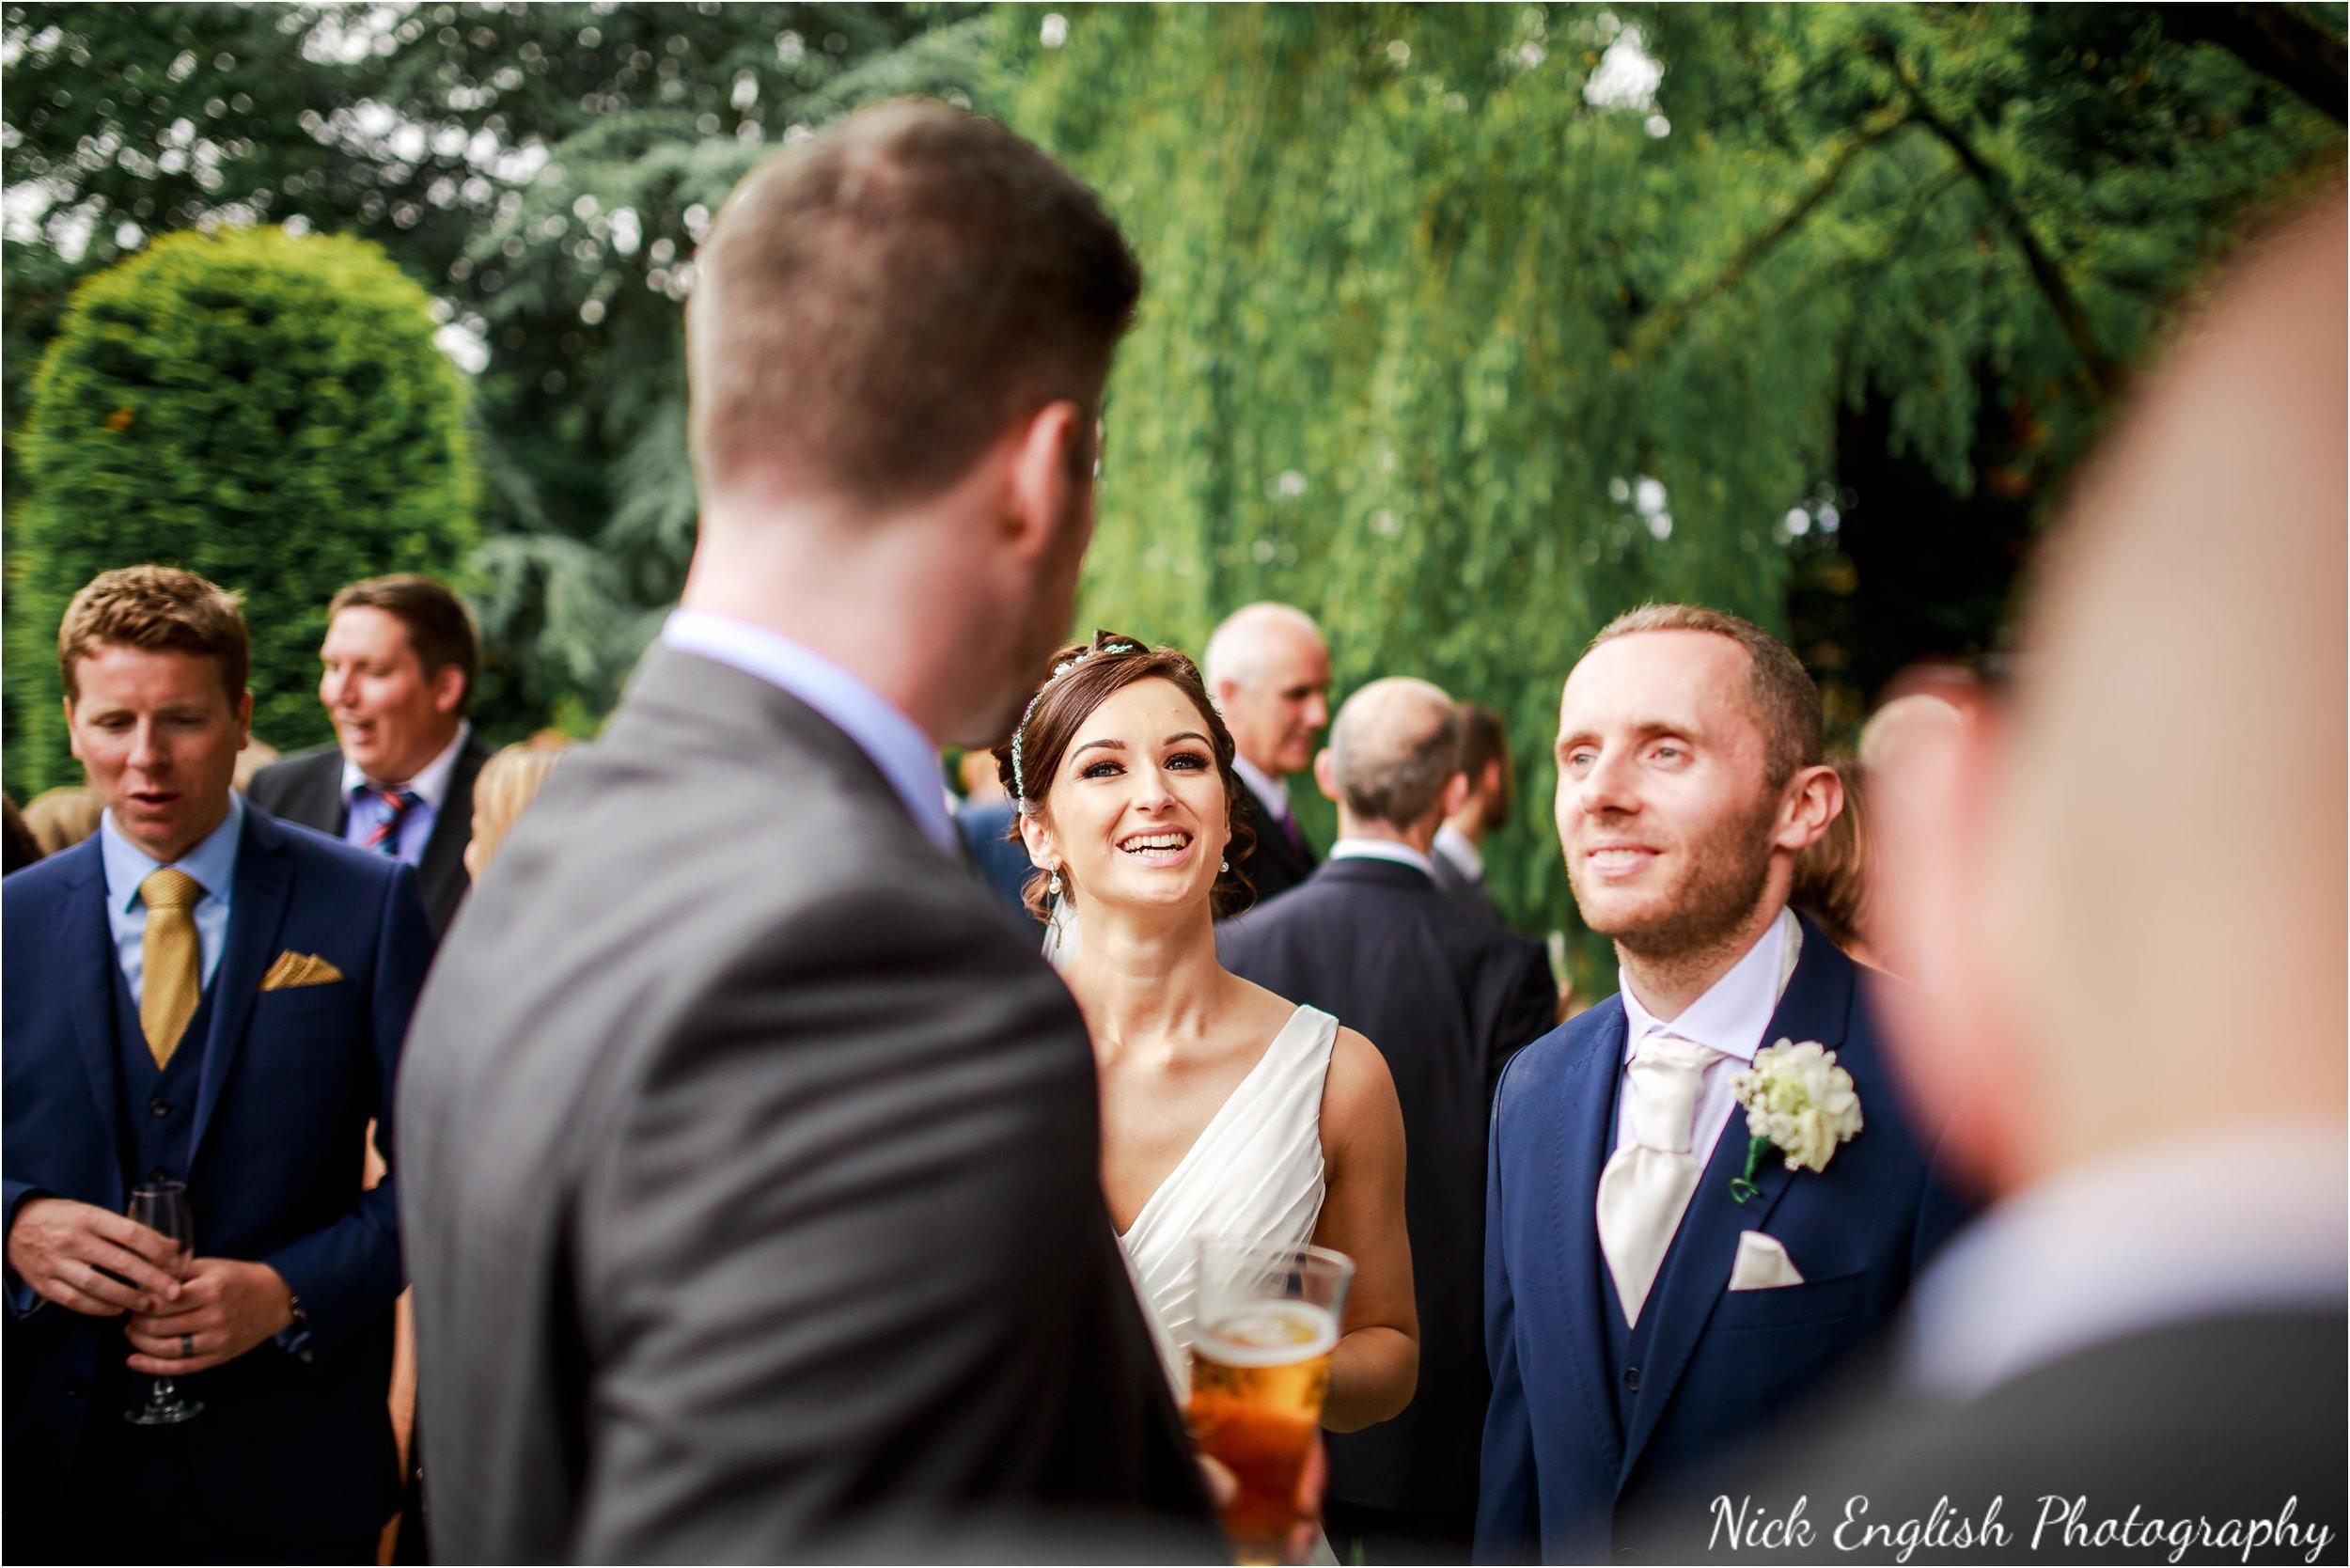 Emily David Wedding Photographs at Barton Grange Preston by Nick English Photography 126jpg.jpeg